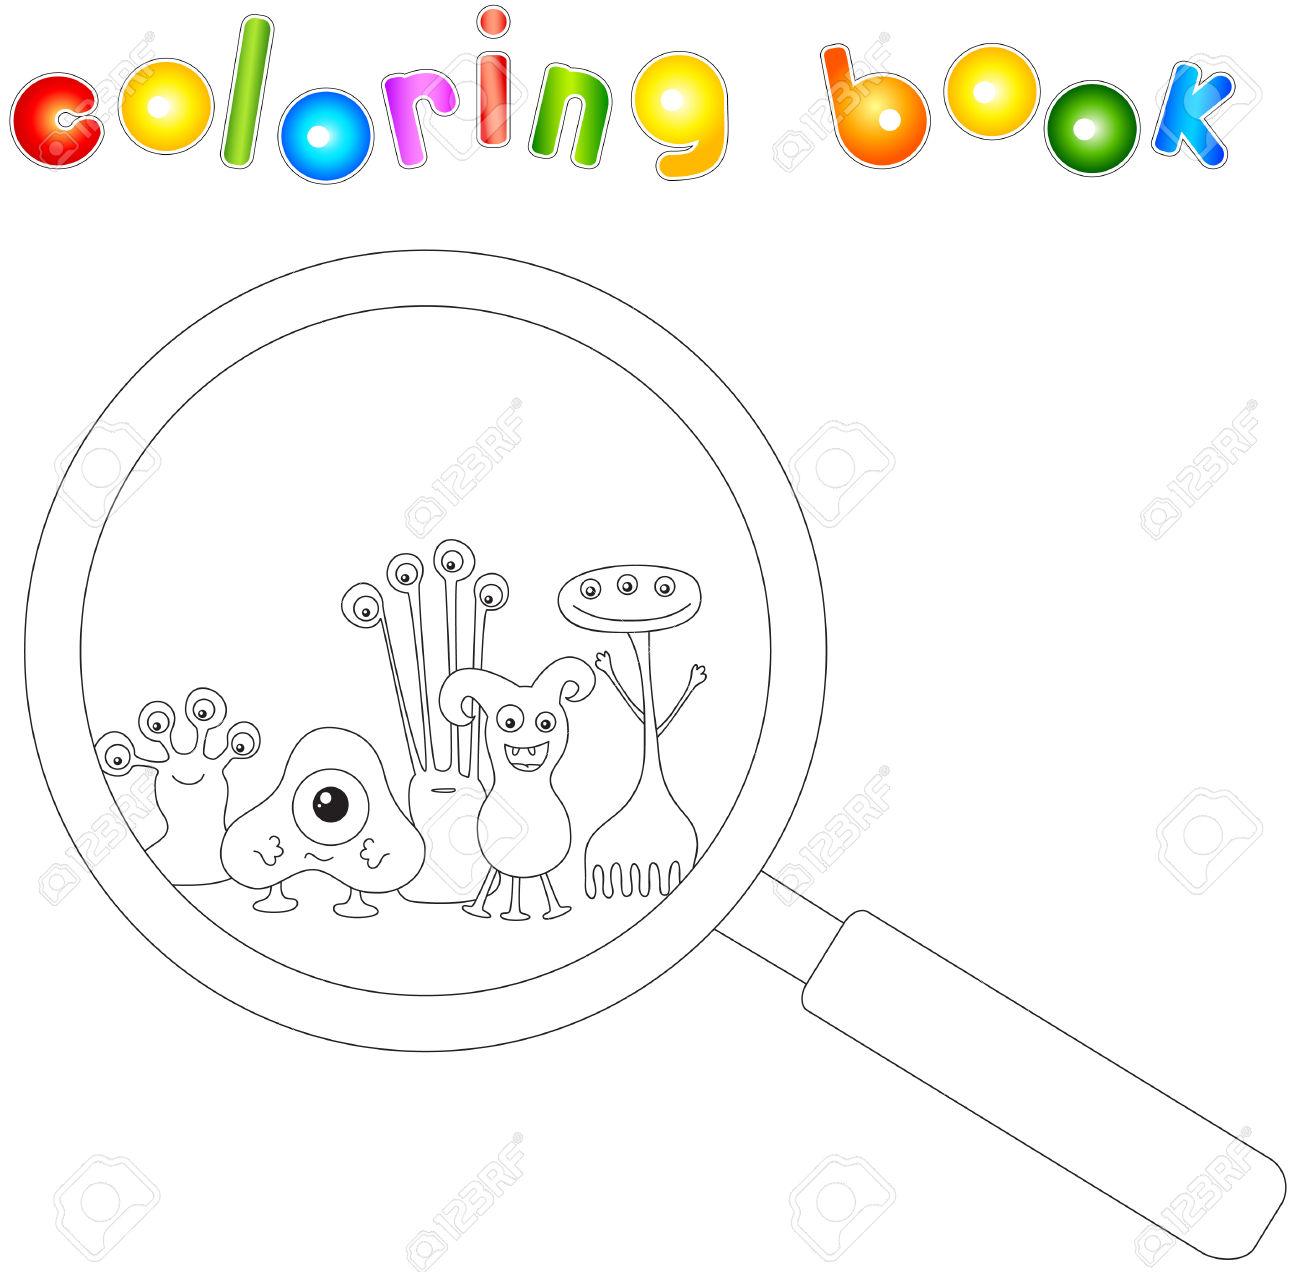 Microbe coloring #14, Download drawings